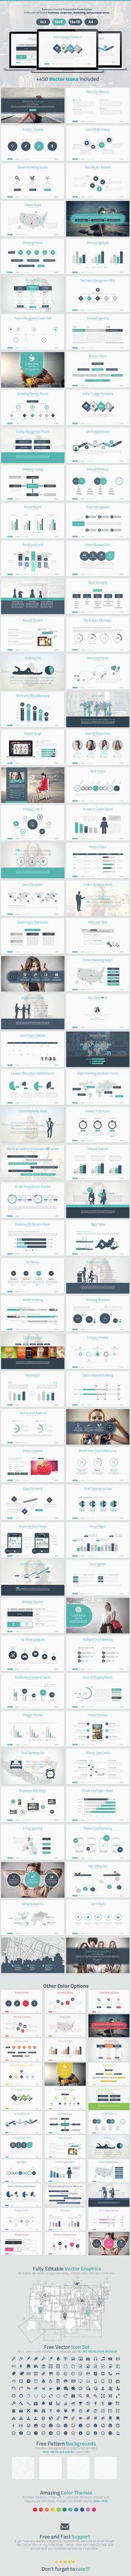 Marketing Strategy Powerpoint Presentation Template #slides Download here: http://graphicriver.net/item/marketing-strategy-powerpoint-presentation/14614905?ref=ksioks